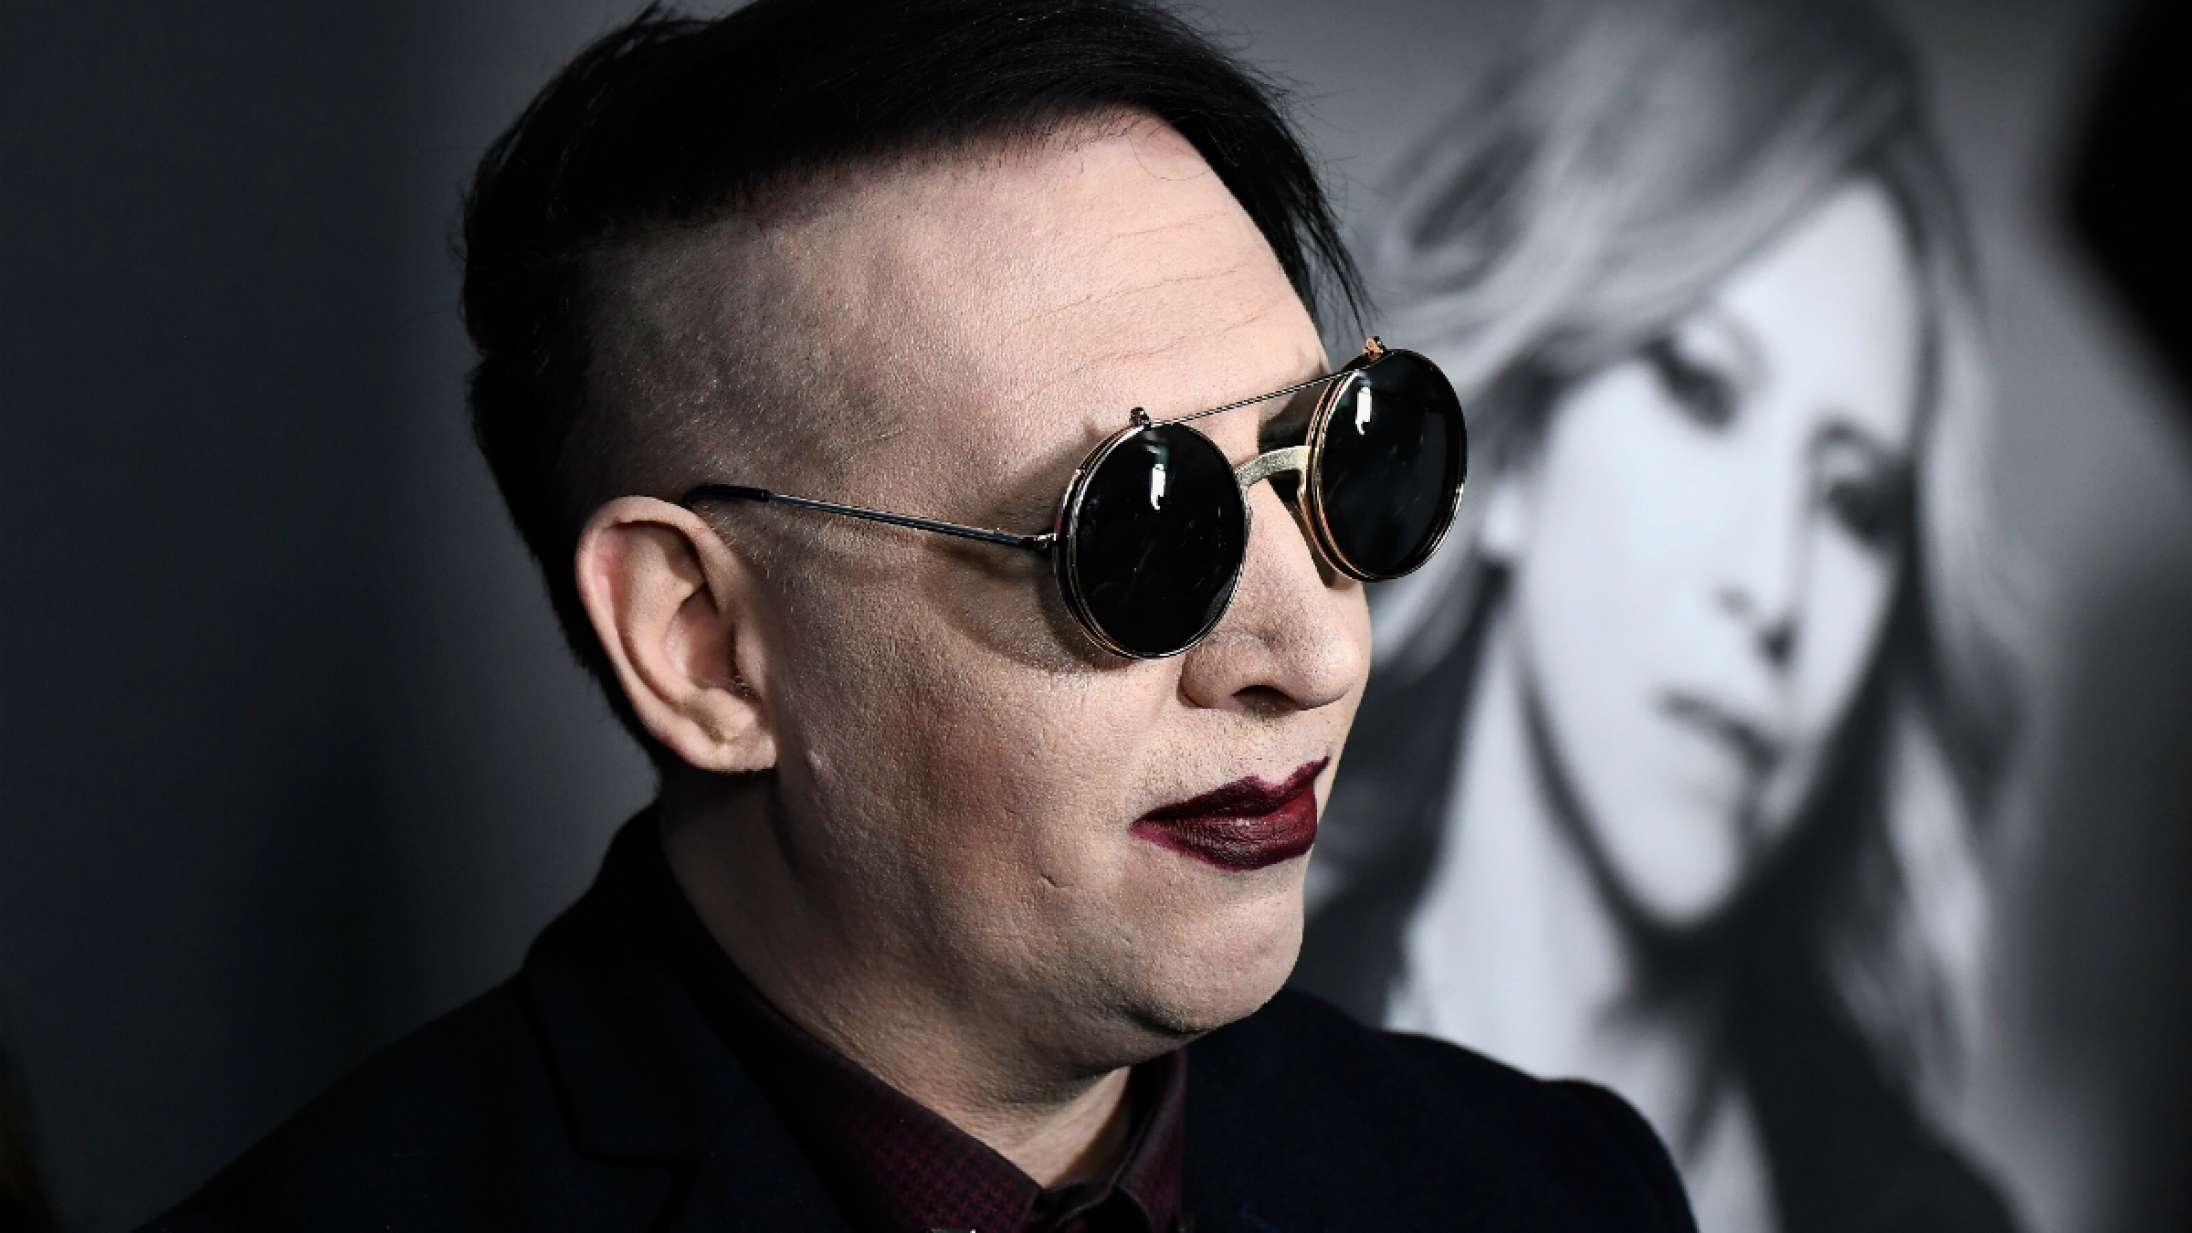 Evan Rachel Wood anklager Marilyn Manson for overgreb og hjernevask – Manson afviser blankt